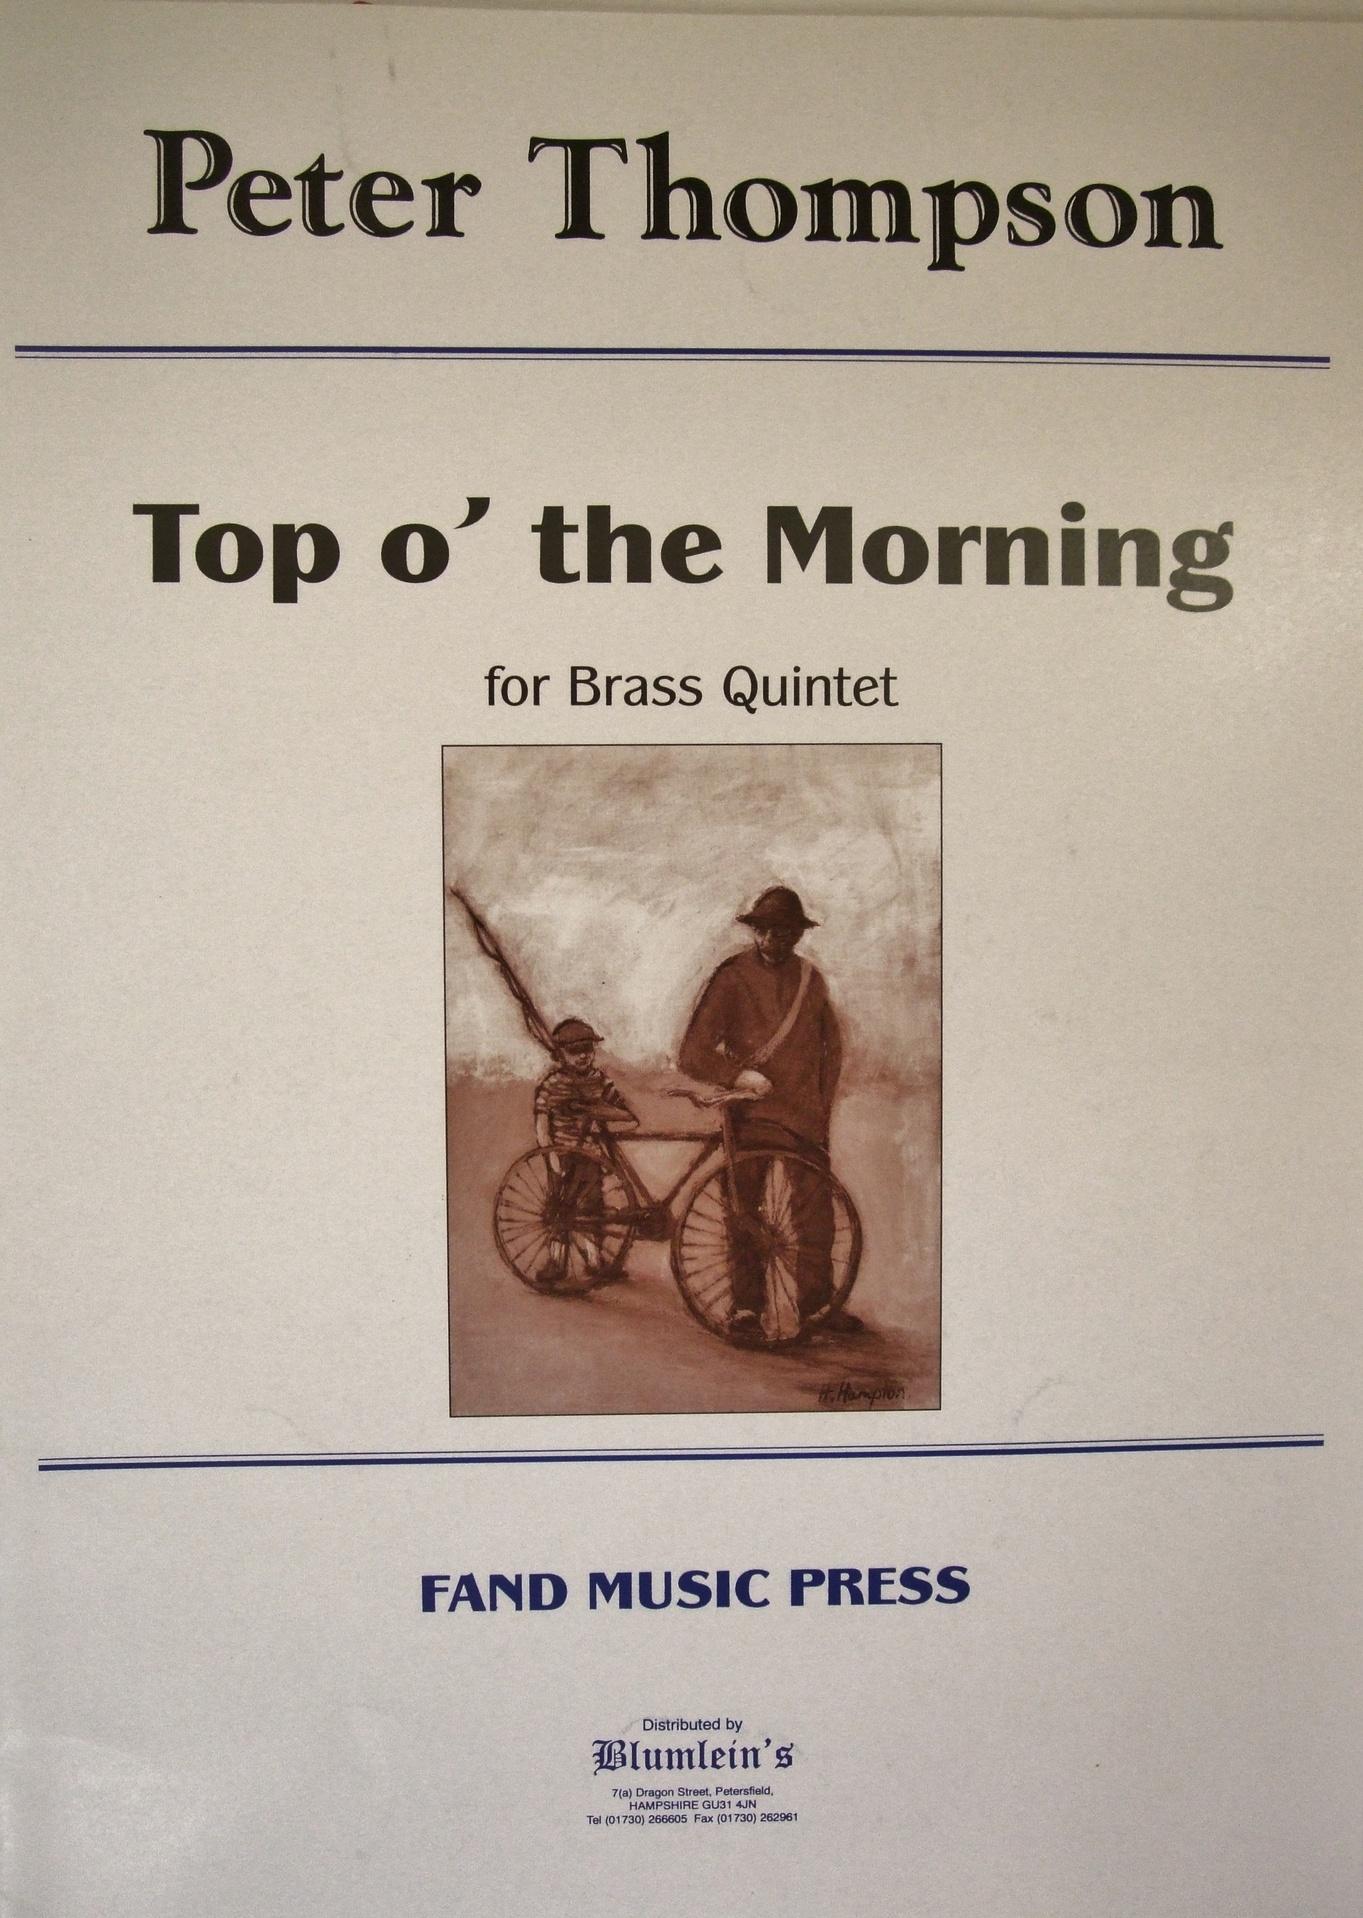 Top o' the Morning